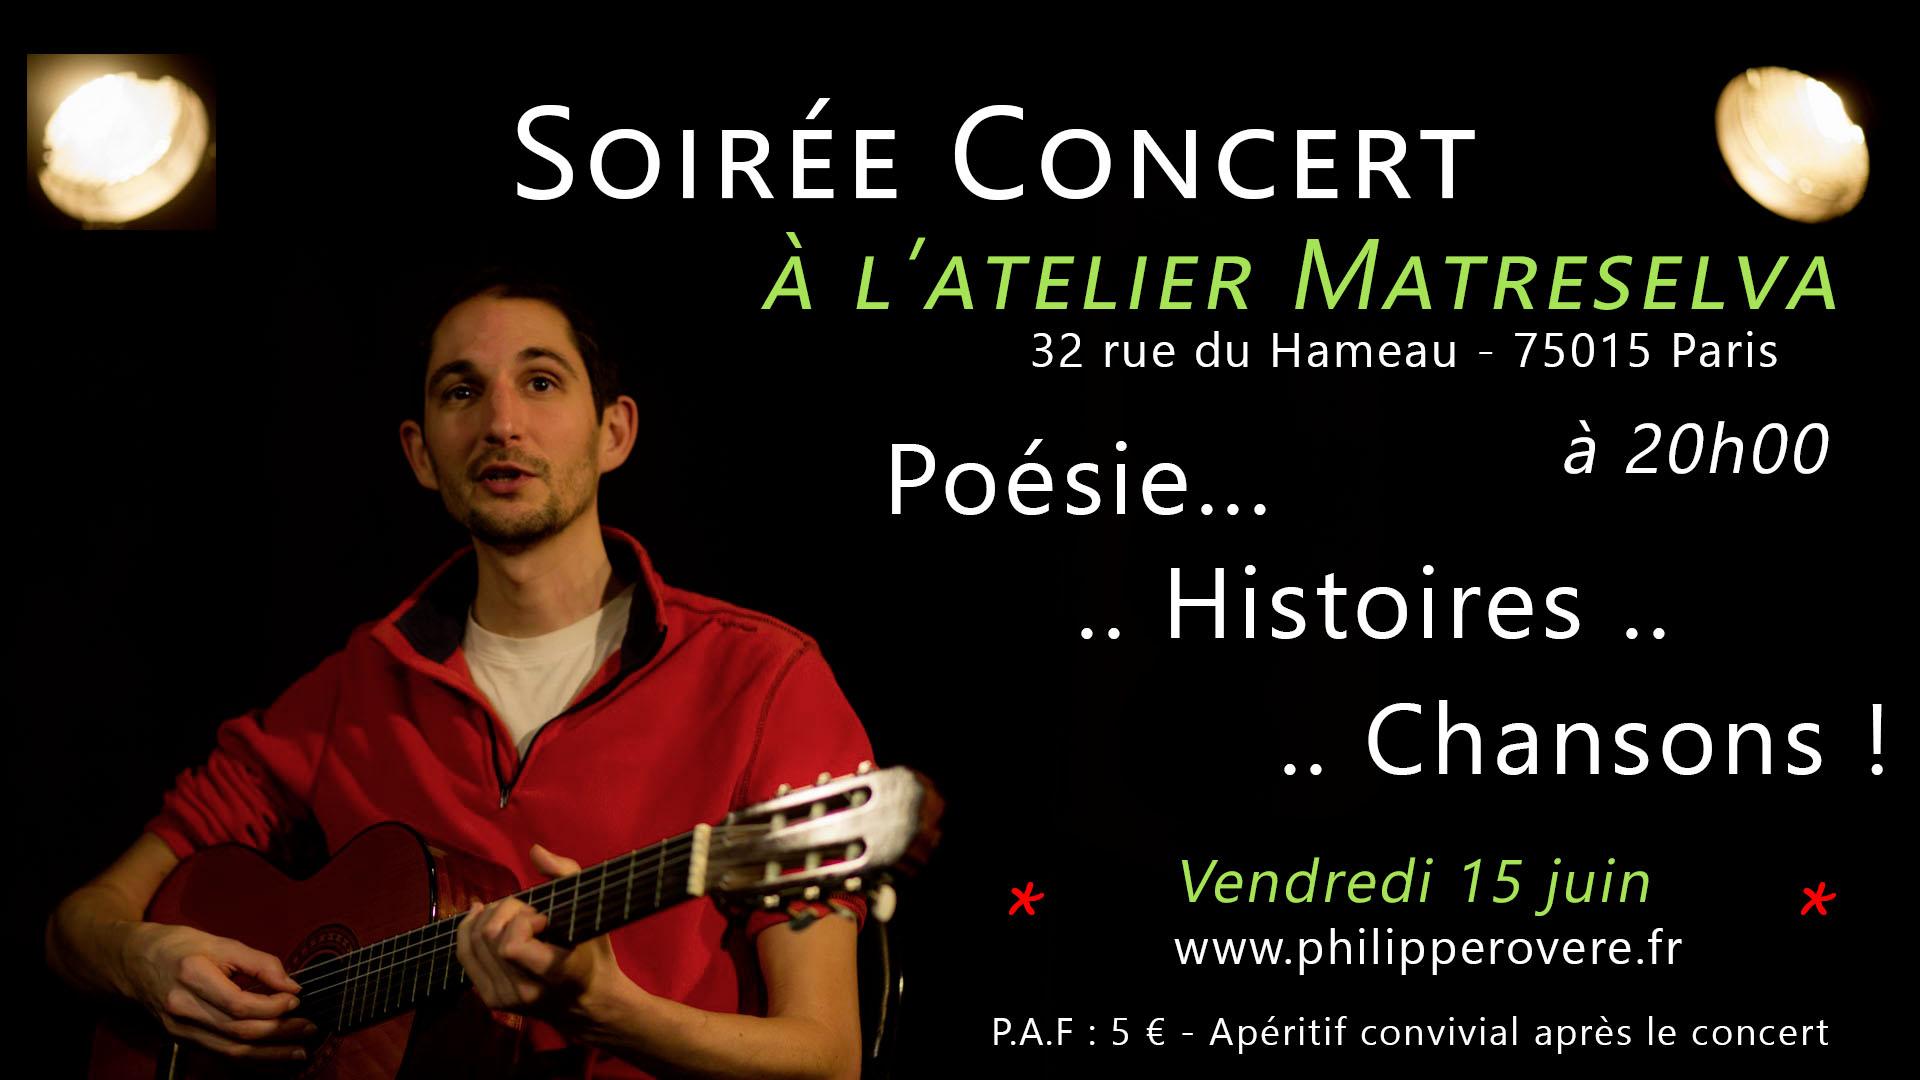 Philippe Rovere - Concert à l'atelier Matreselva